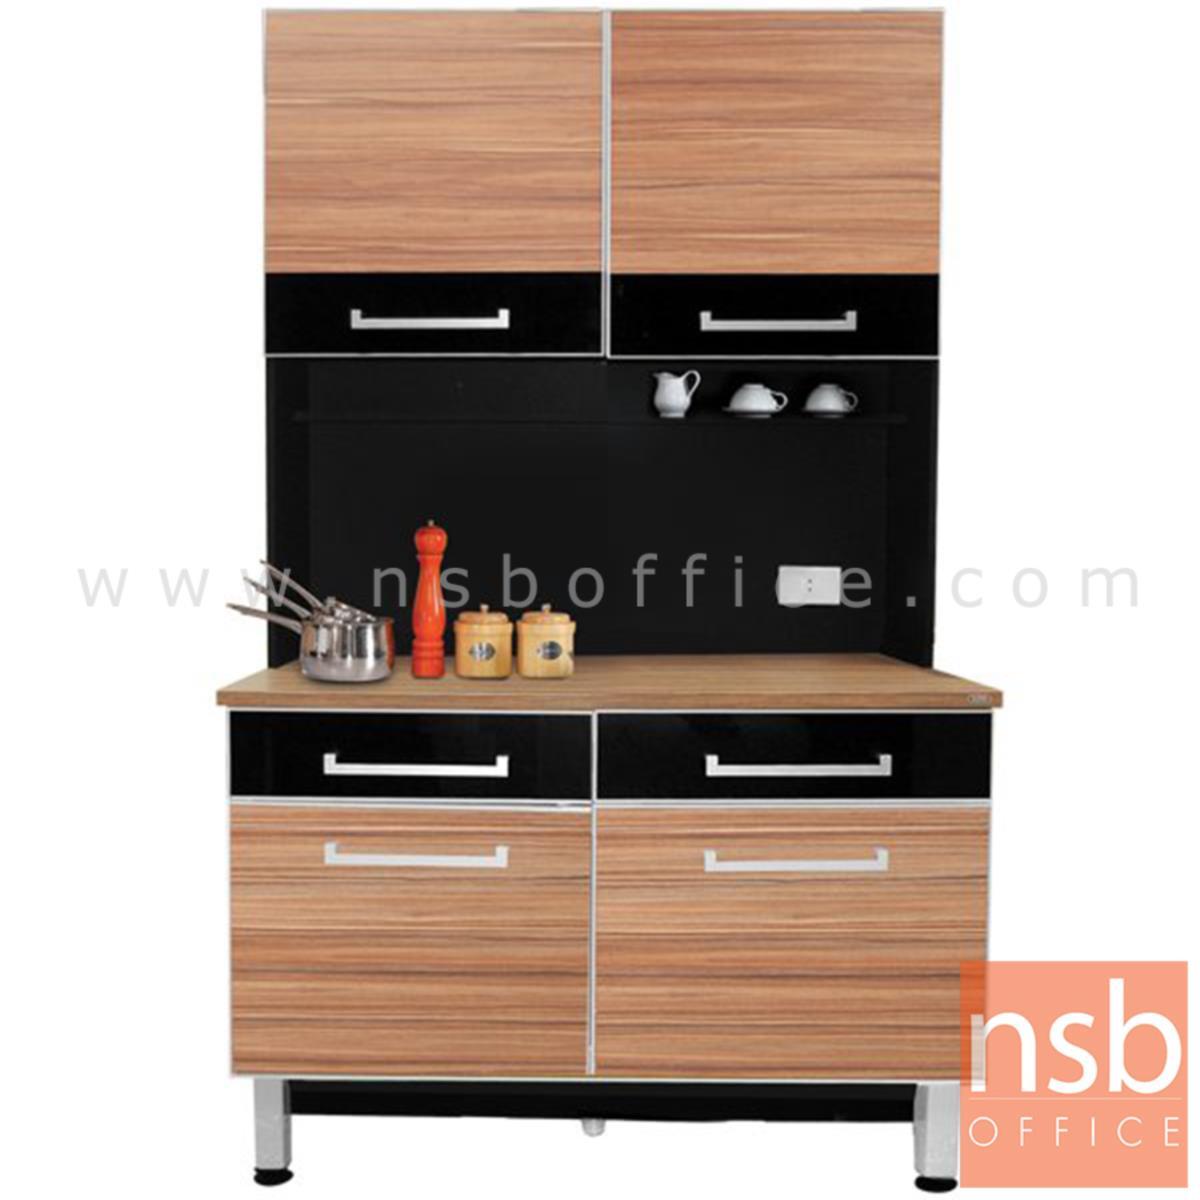 A33A015:ชุดตู้ครัวสูง ทันสมัย  รุ่น Mingles (มิงเกิ้ลส์)  ขนาด 120W cm. สีวอลนัทตัดกระจกชาดำ